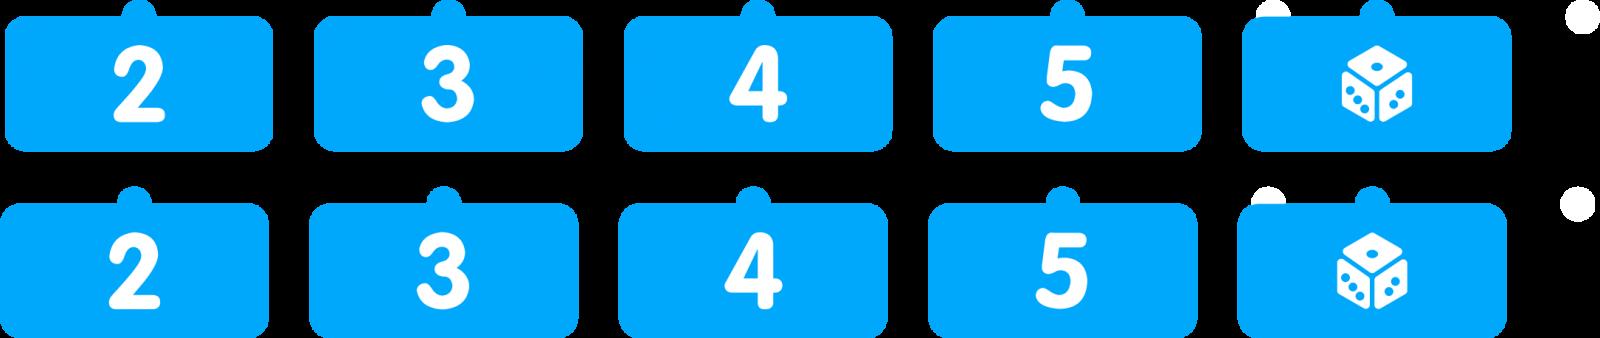 Matatalab Coding Block - STEM Toys - Matatalab